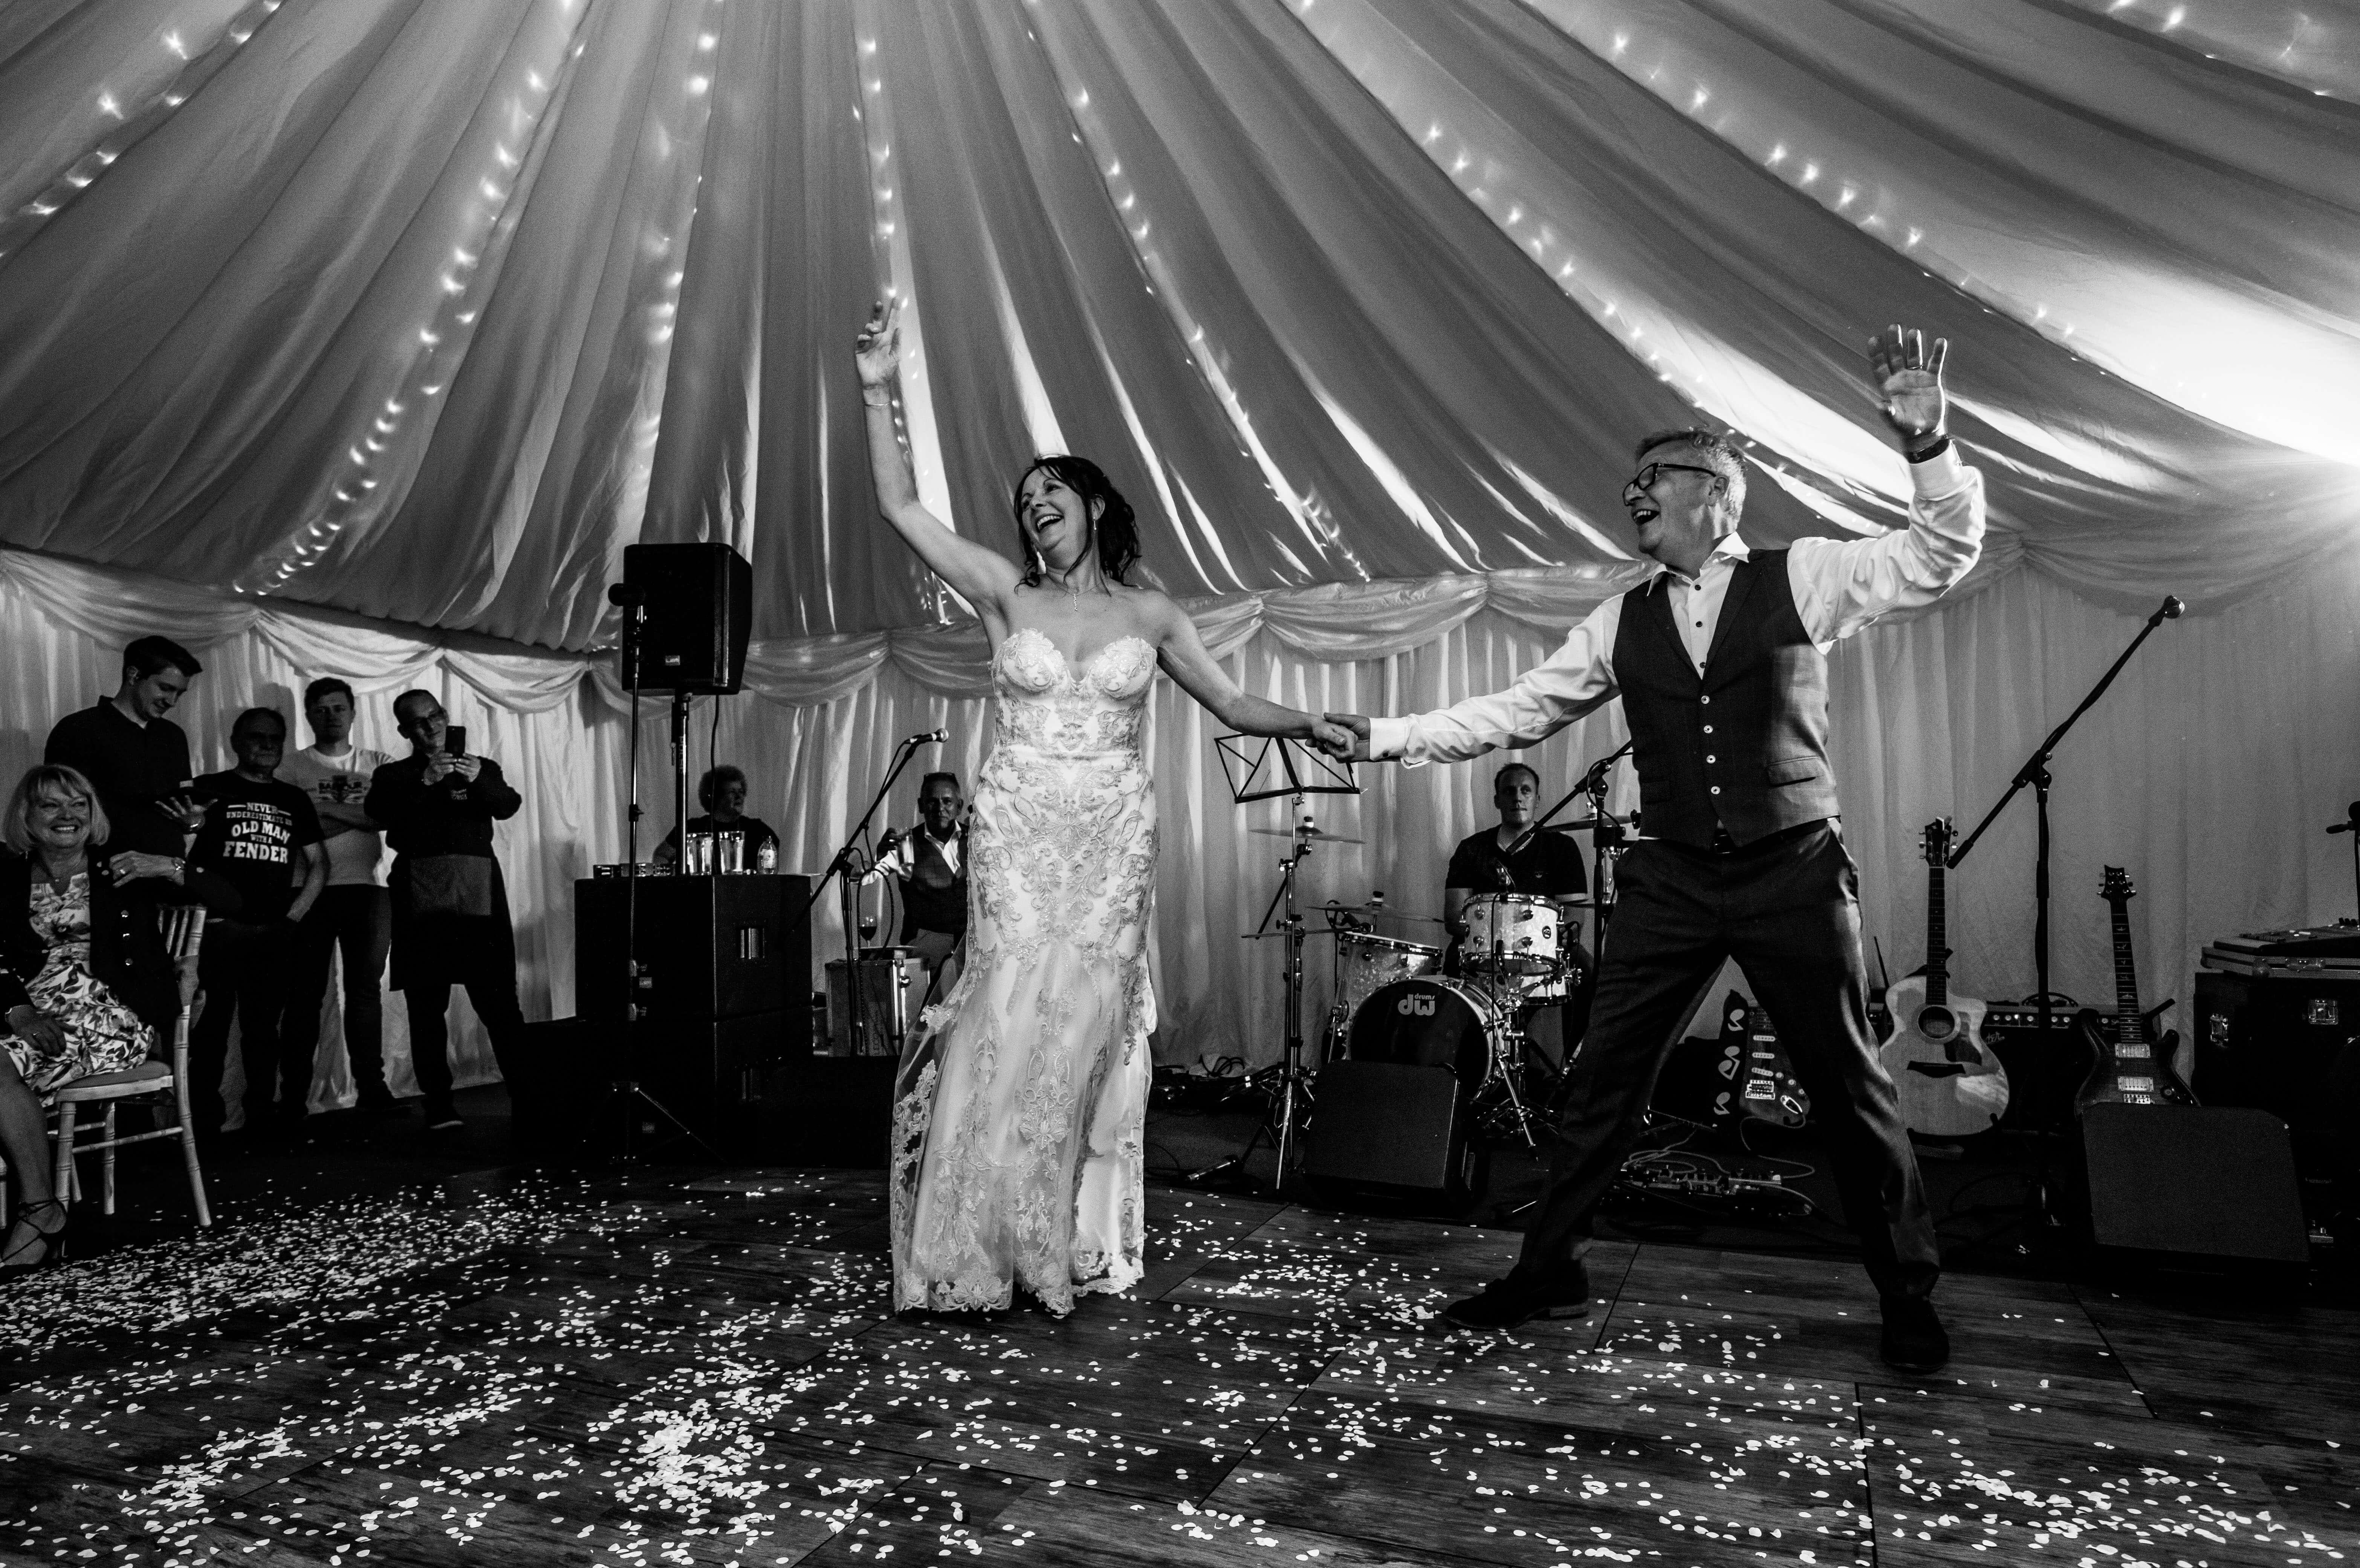 Natural wedding photographer capturing first dance